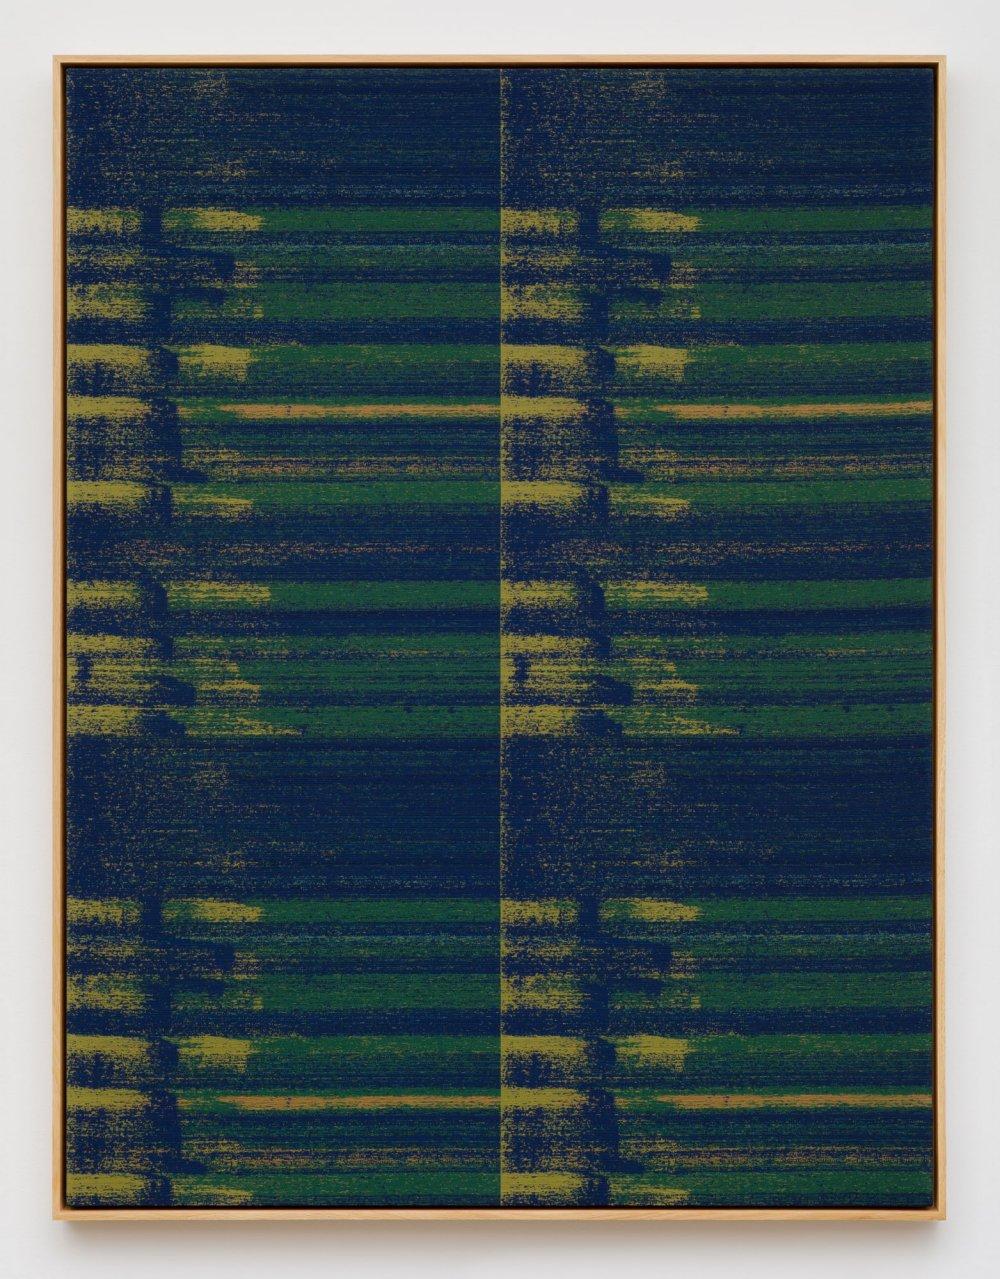 Negative Entropy (Atago Jinja, Clapping Prayer, Blue Gold, Quad)